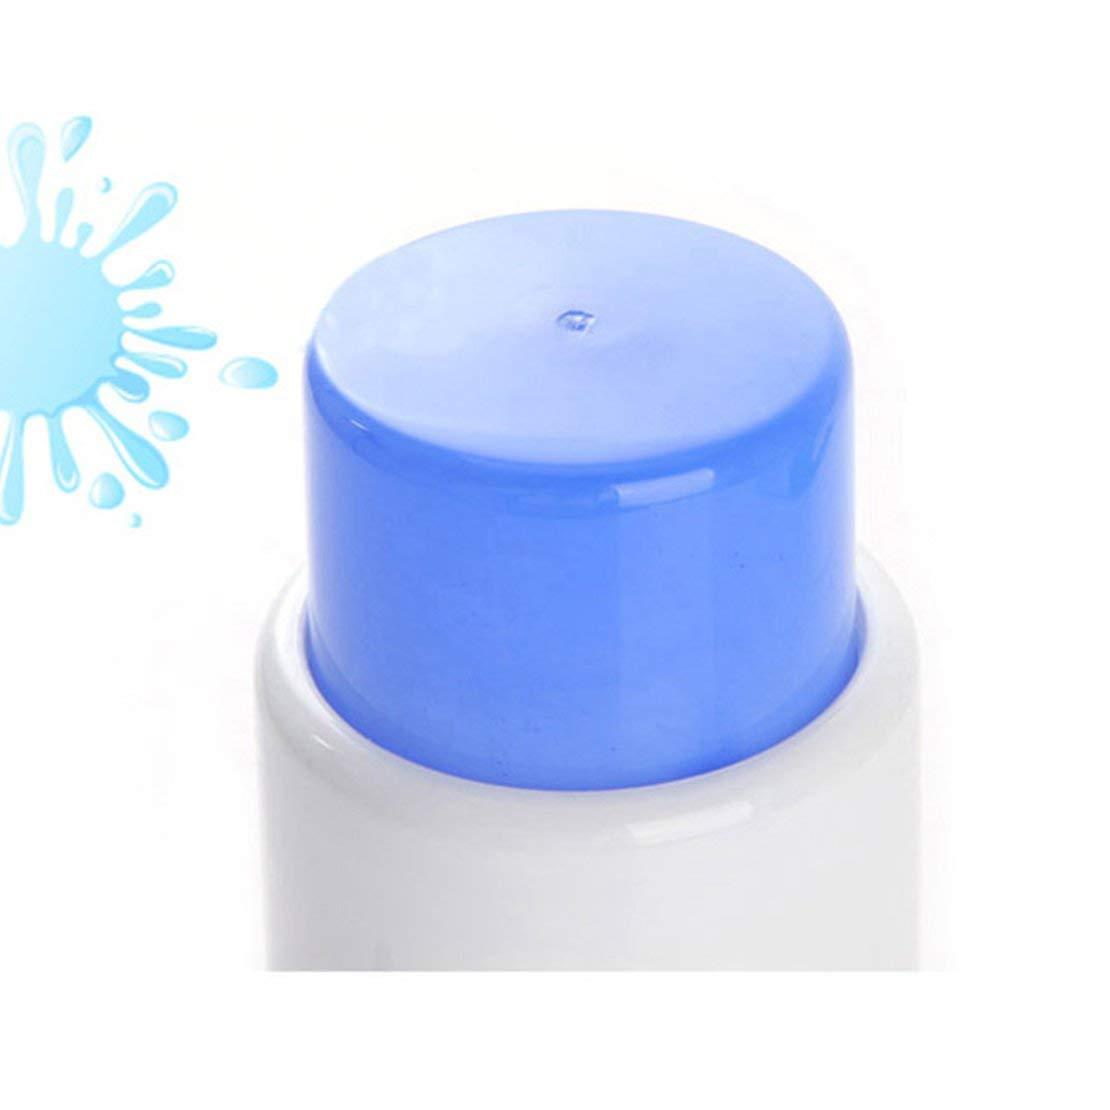 Sanzhileg Dispensador de Agua Potable de presión Manual portátil de Mannual Tubo extraíble Acción al vacío Bomba de Agua de la Bomba Herramientas del Grifo ...